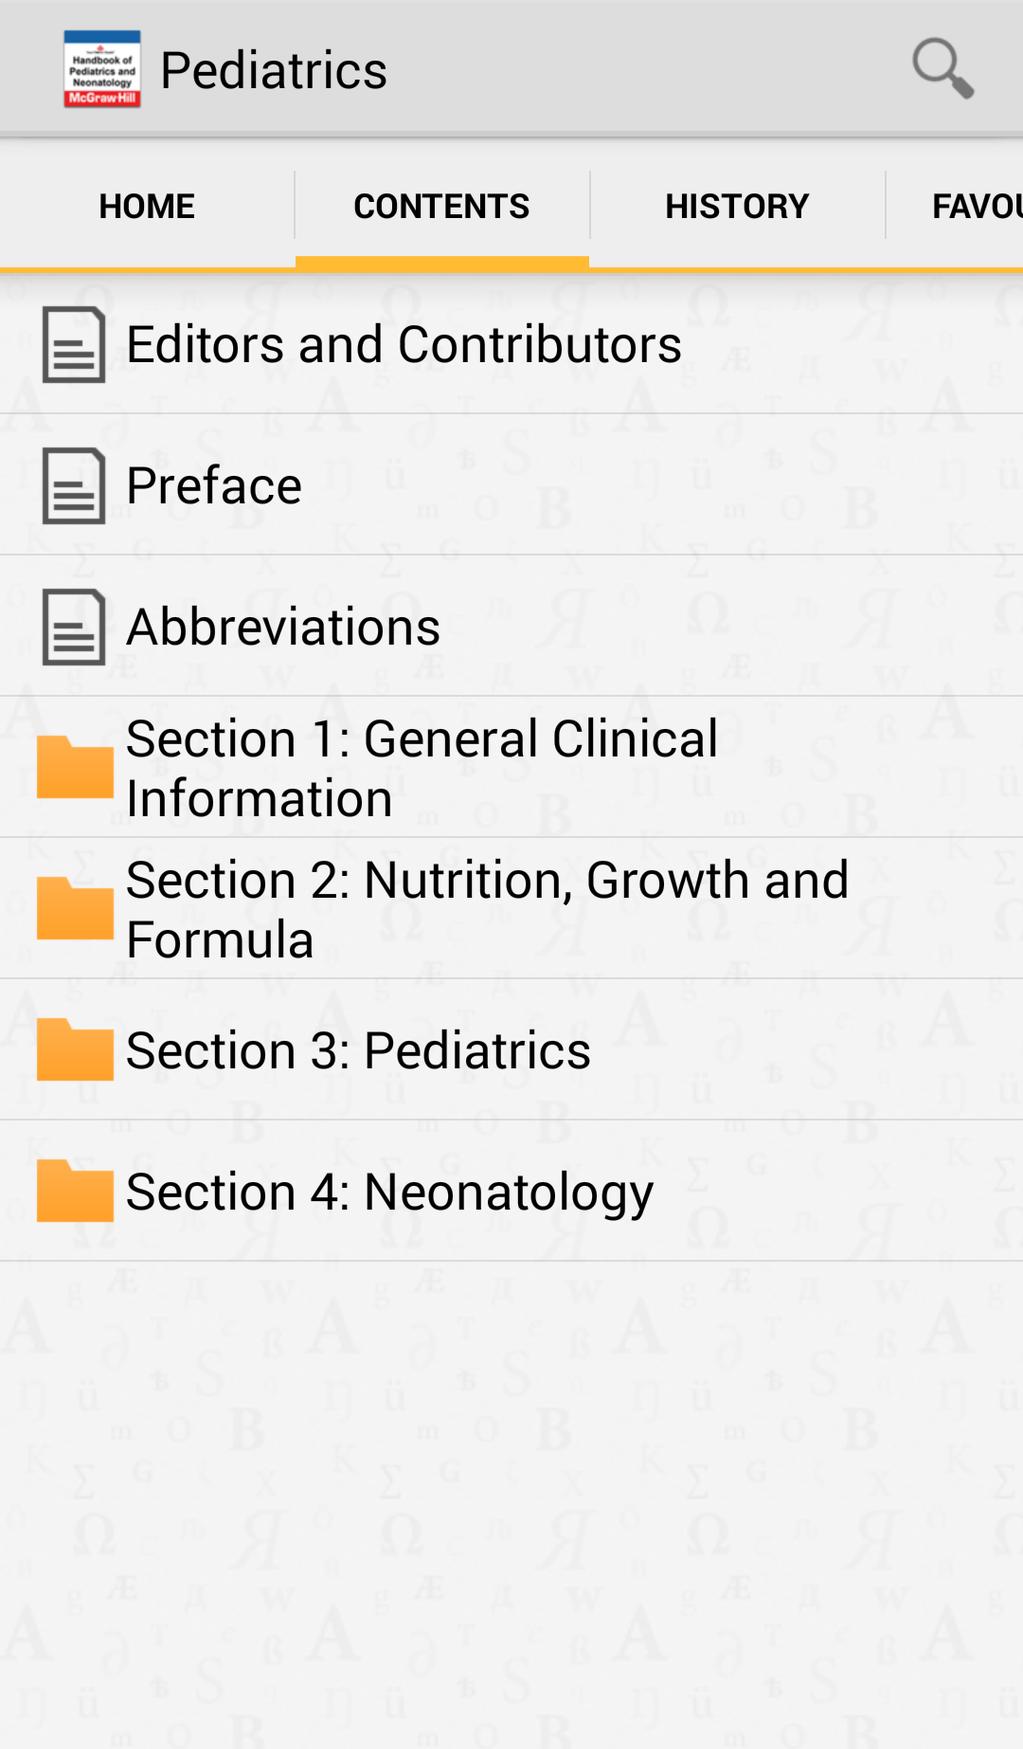 Texas Children's Hospital Handbook of Pediatrics and Neonatology Screenshot 3